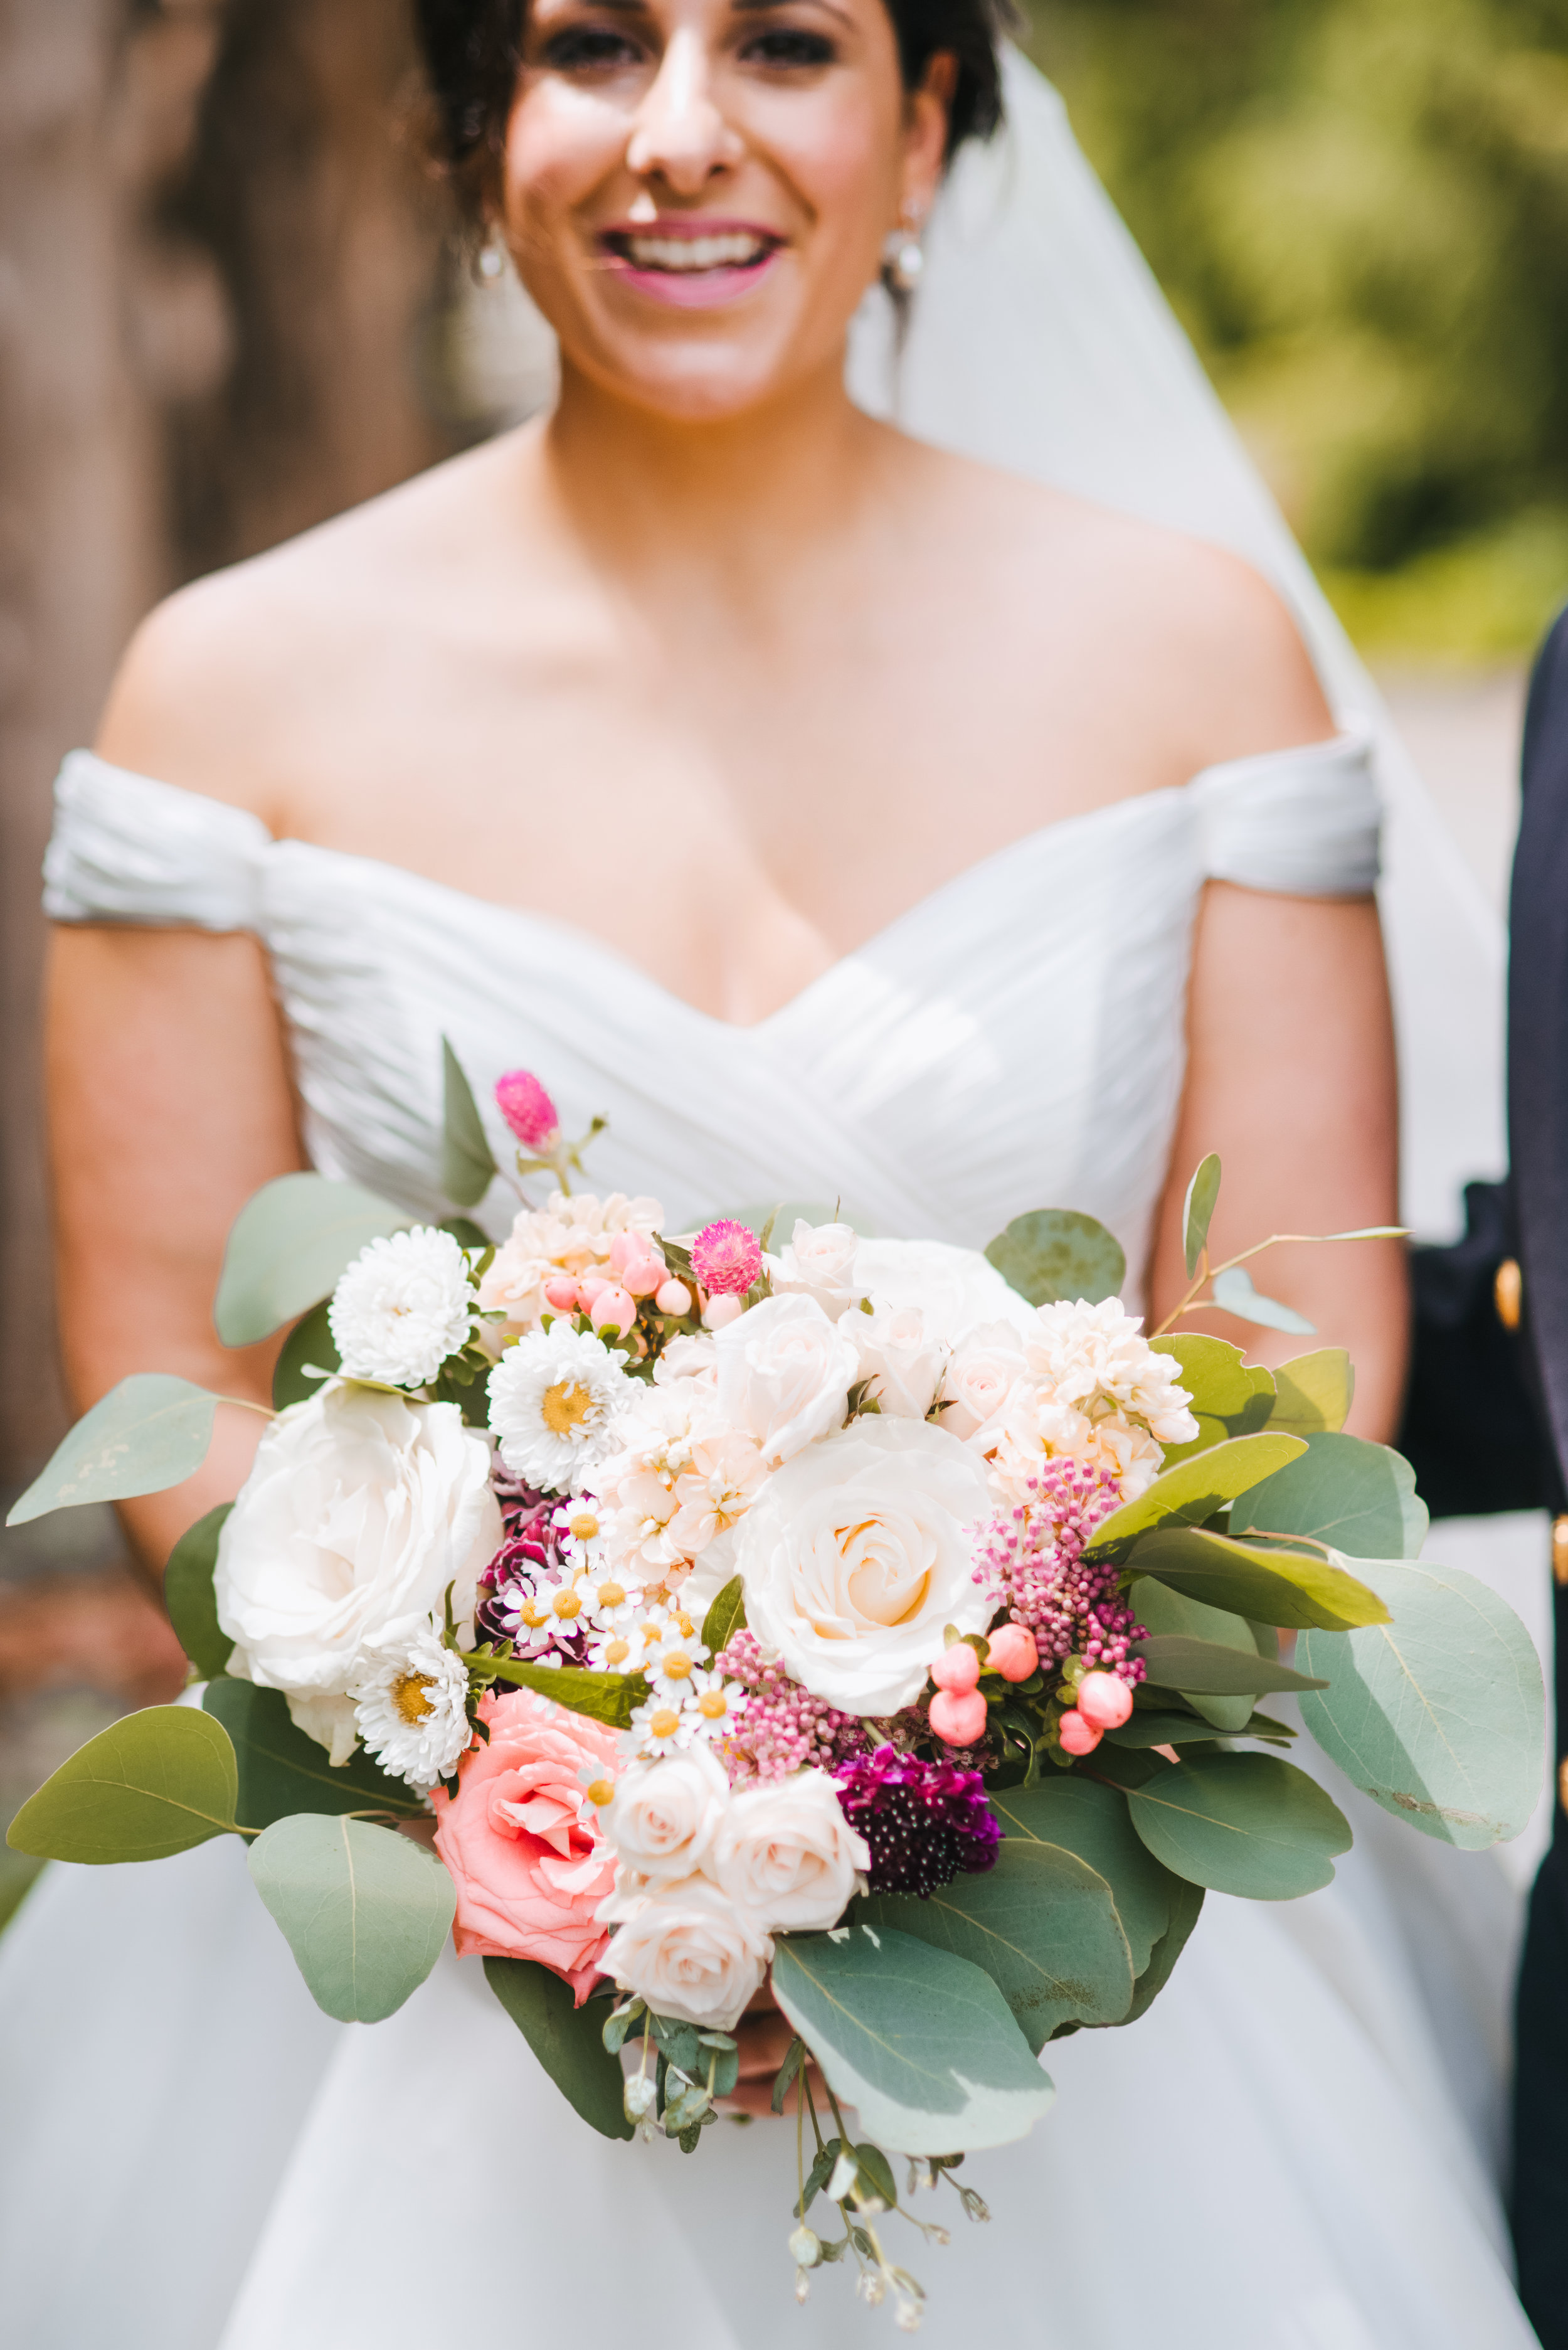 20180828_weddingwebsite_small_47.jpg